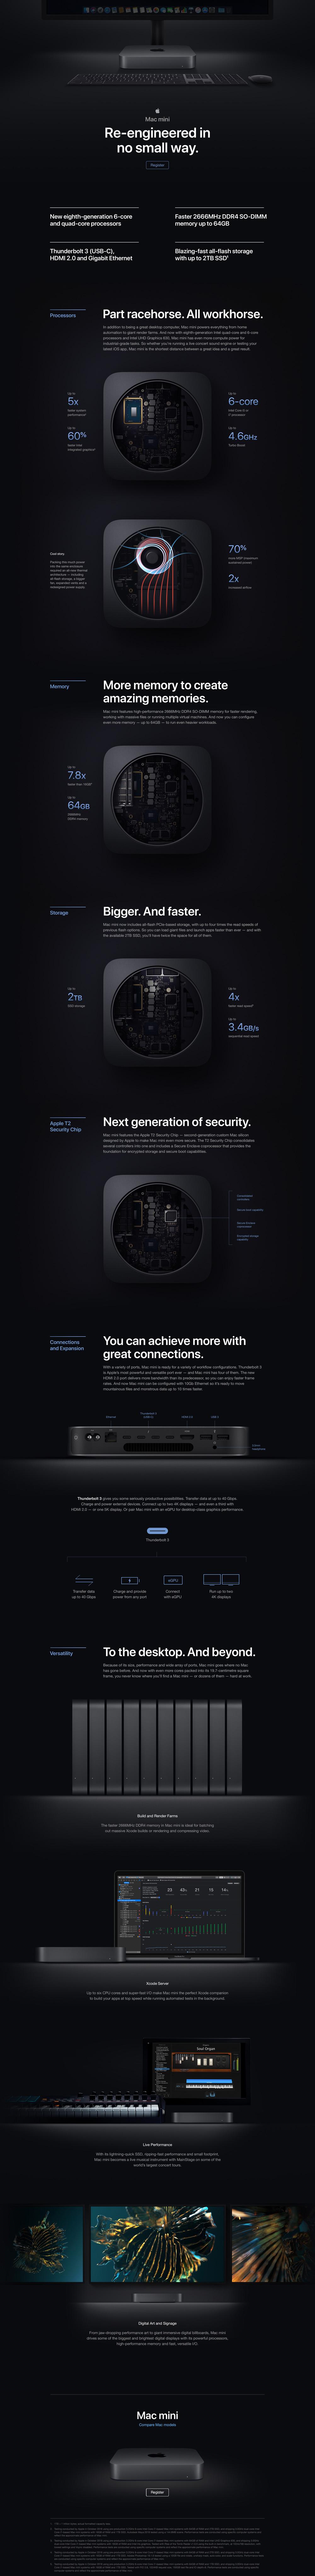 Product Page Mac mini